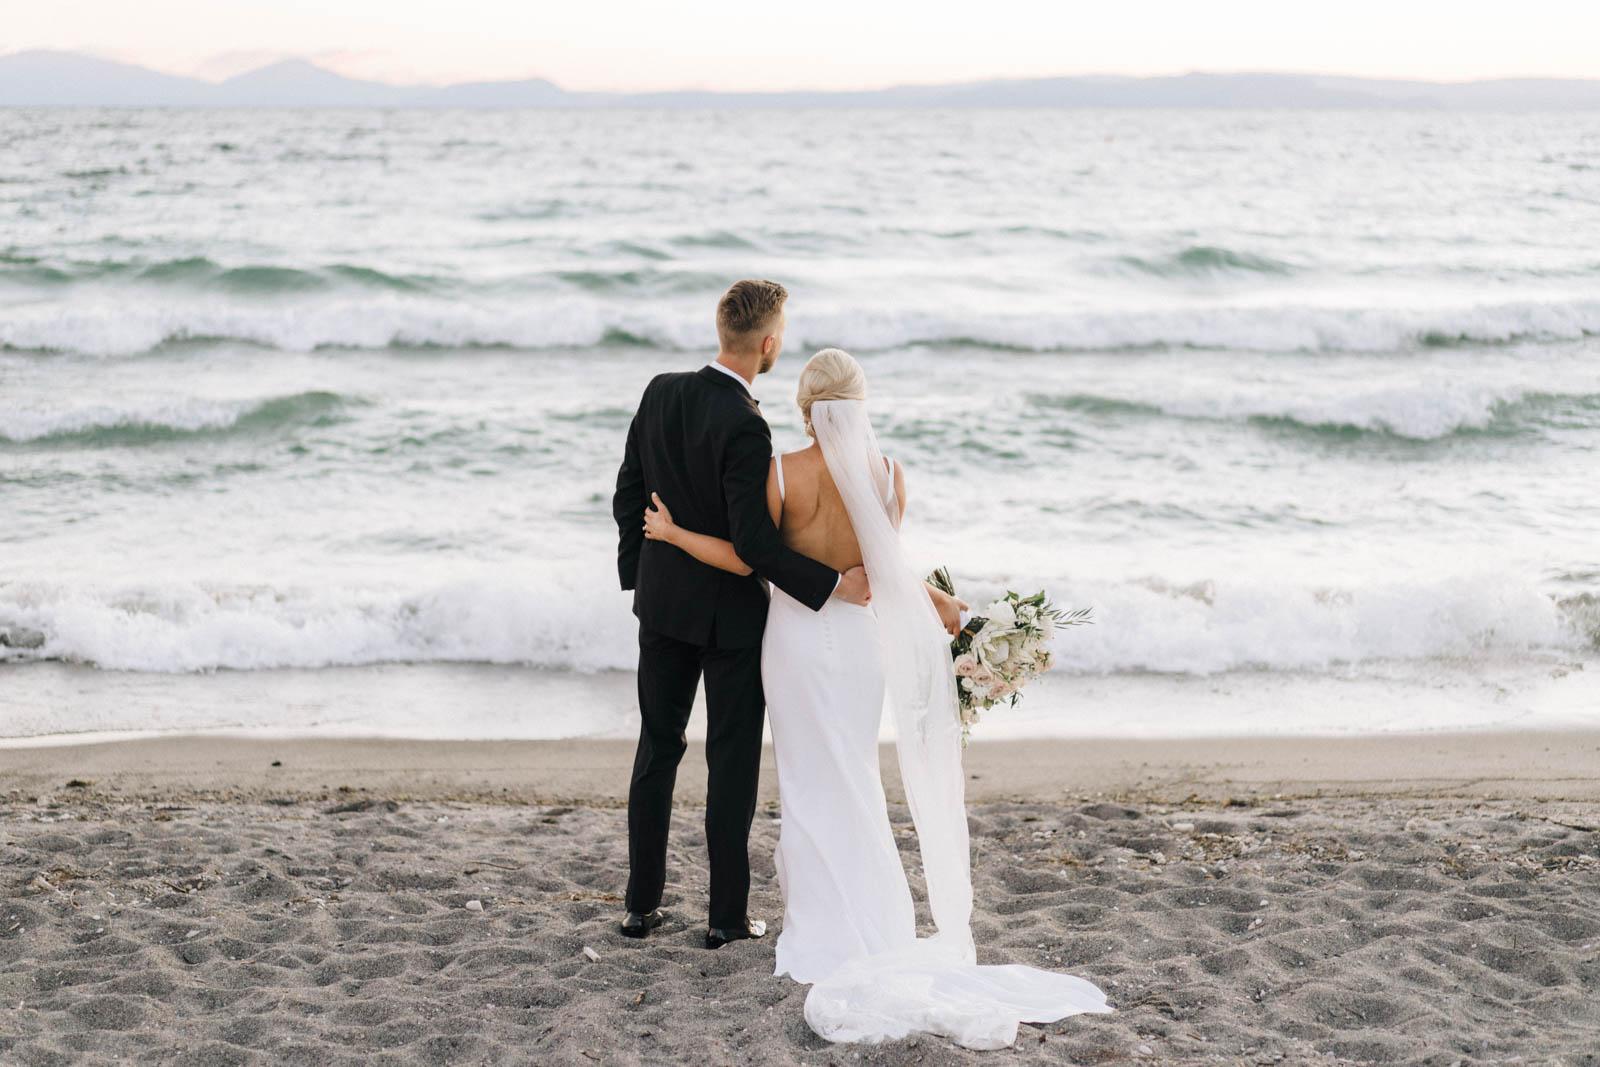 newfound-k-s-hilton-taupo-wedding-photographer-093